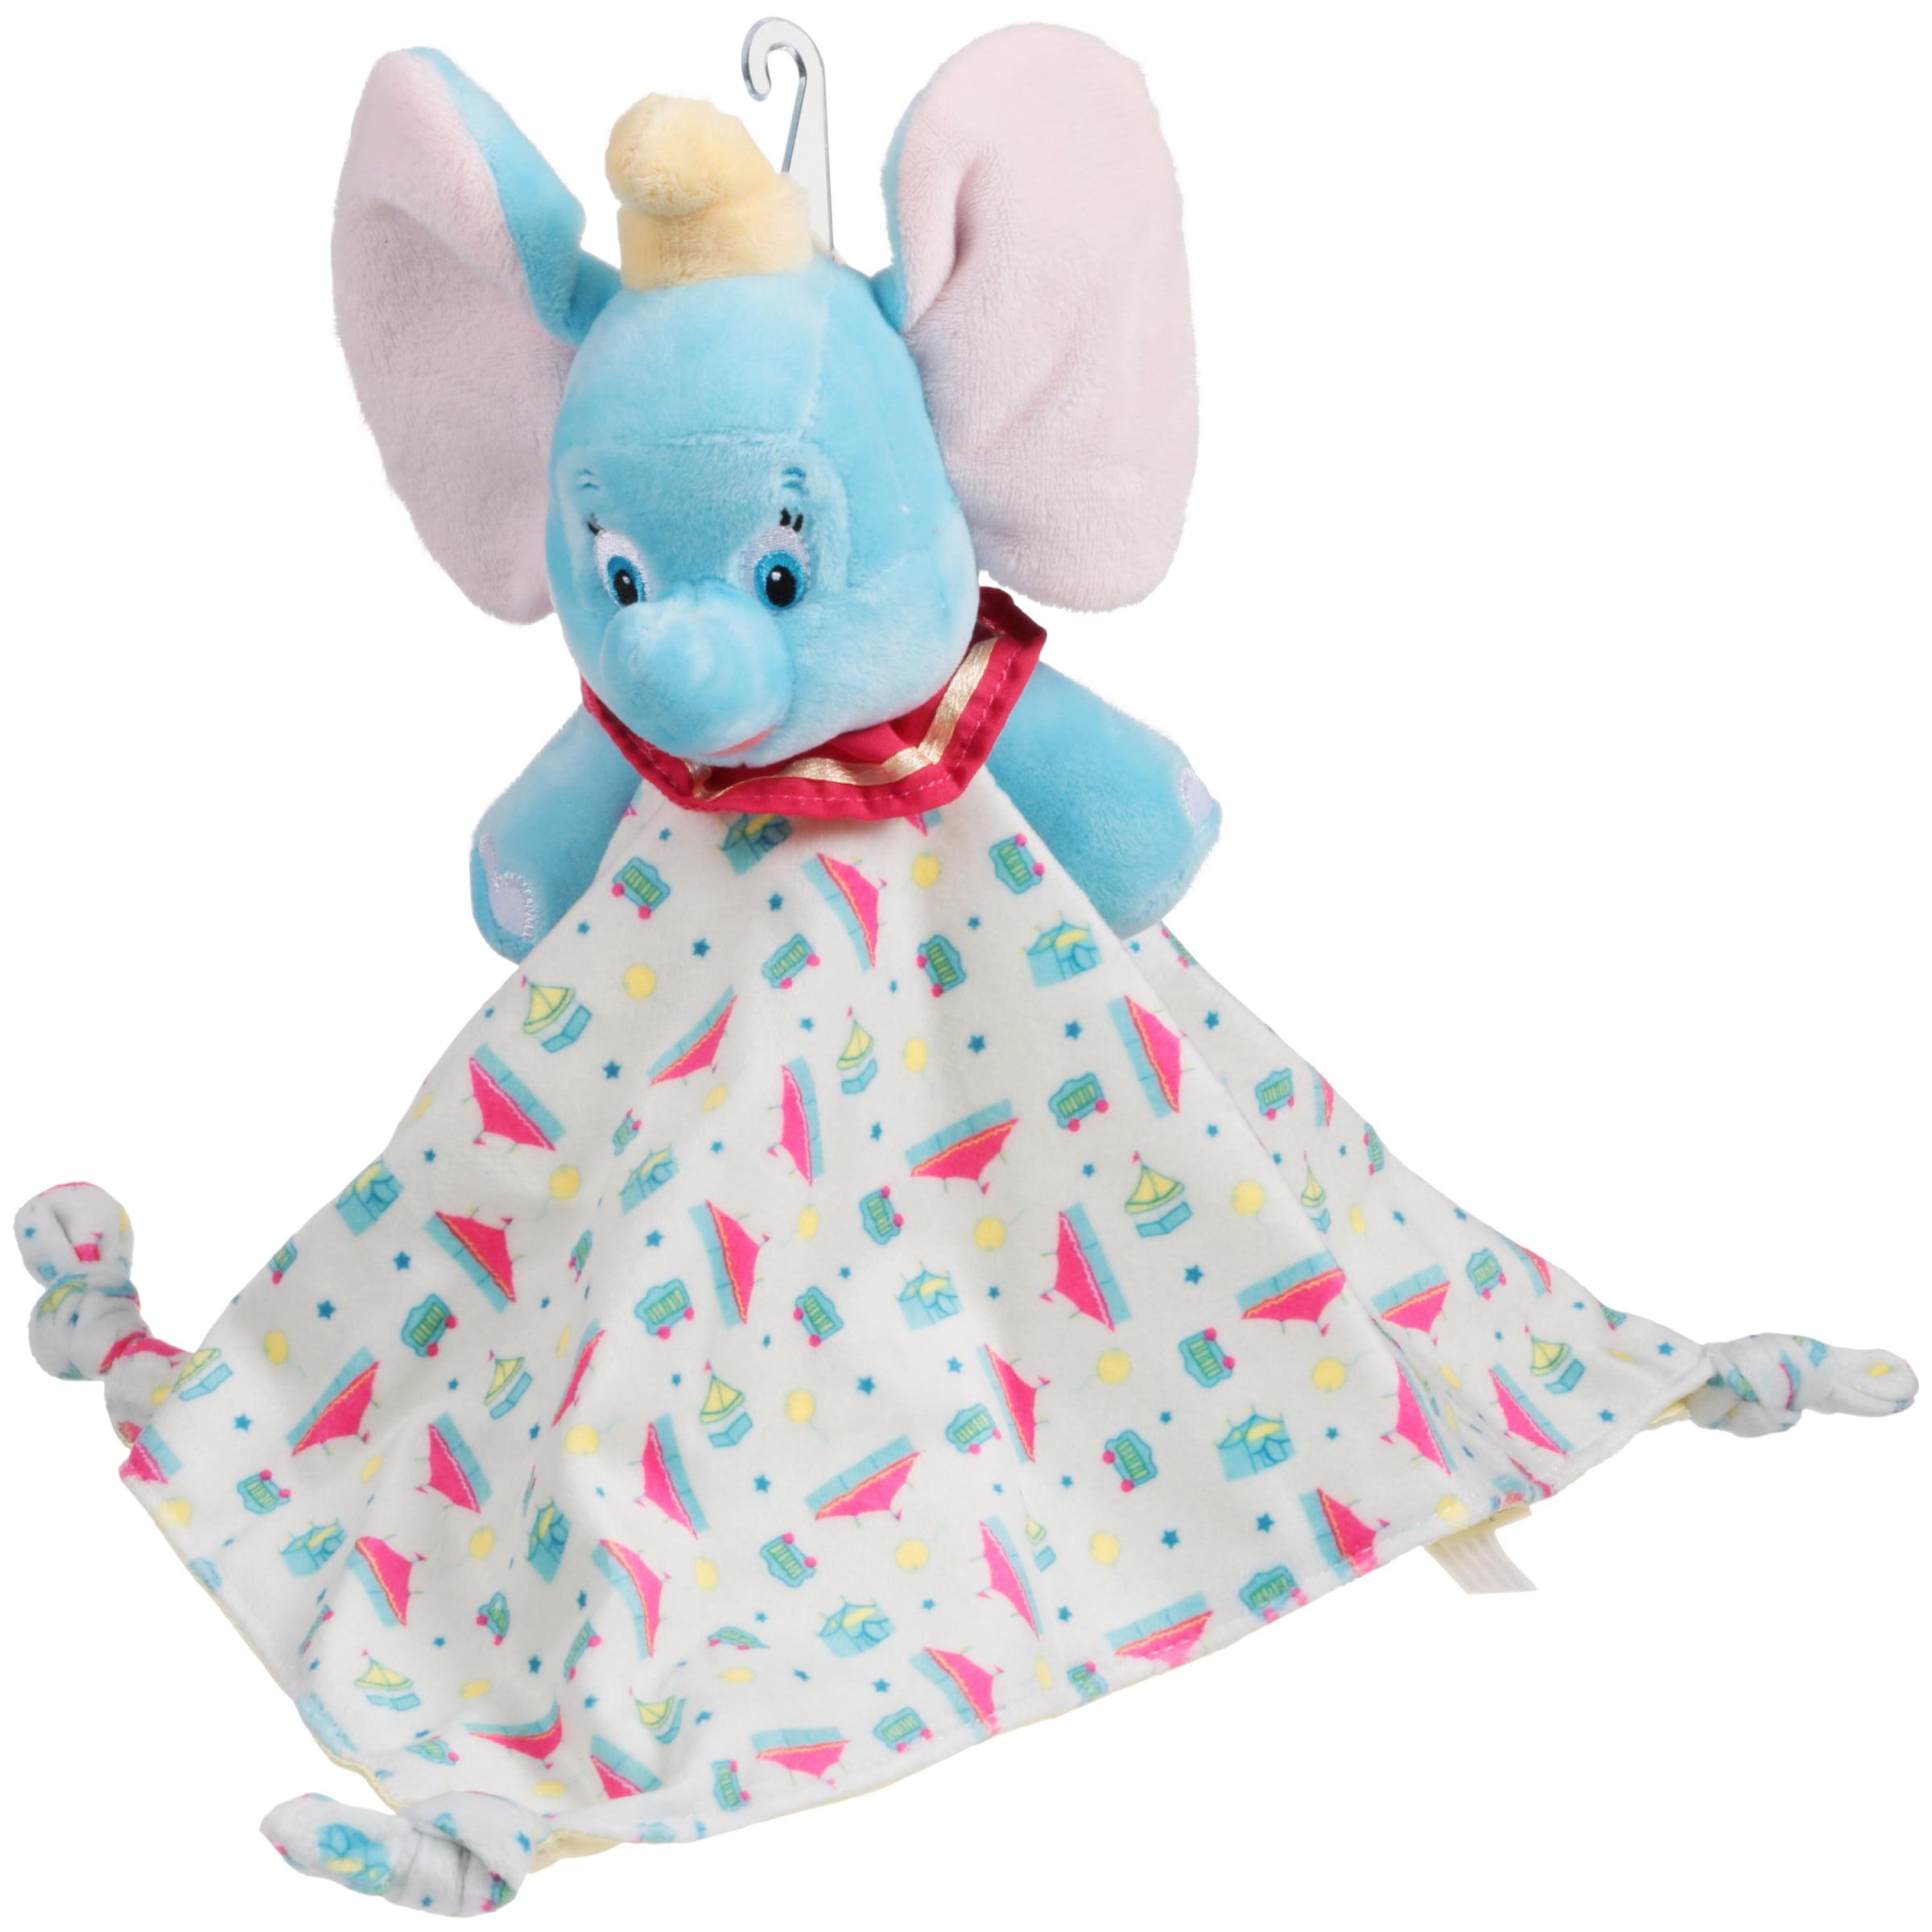 Disney Baby Dumbo Doll with Blanket